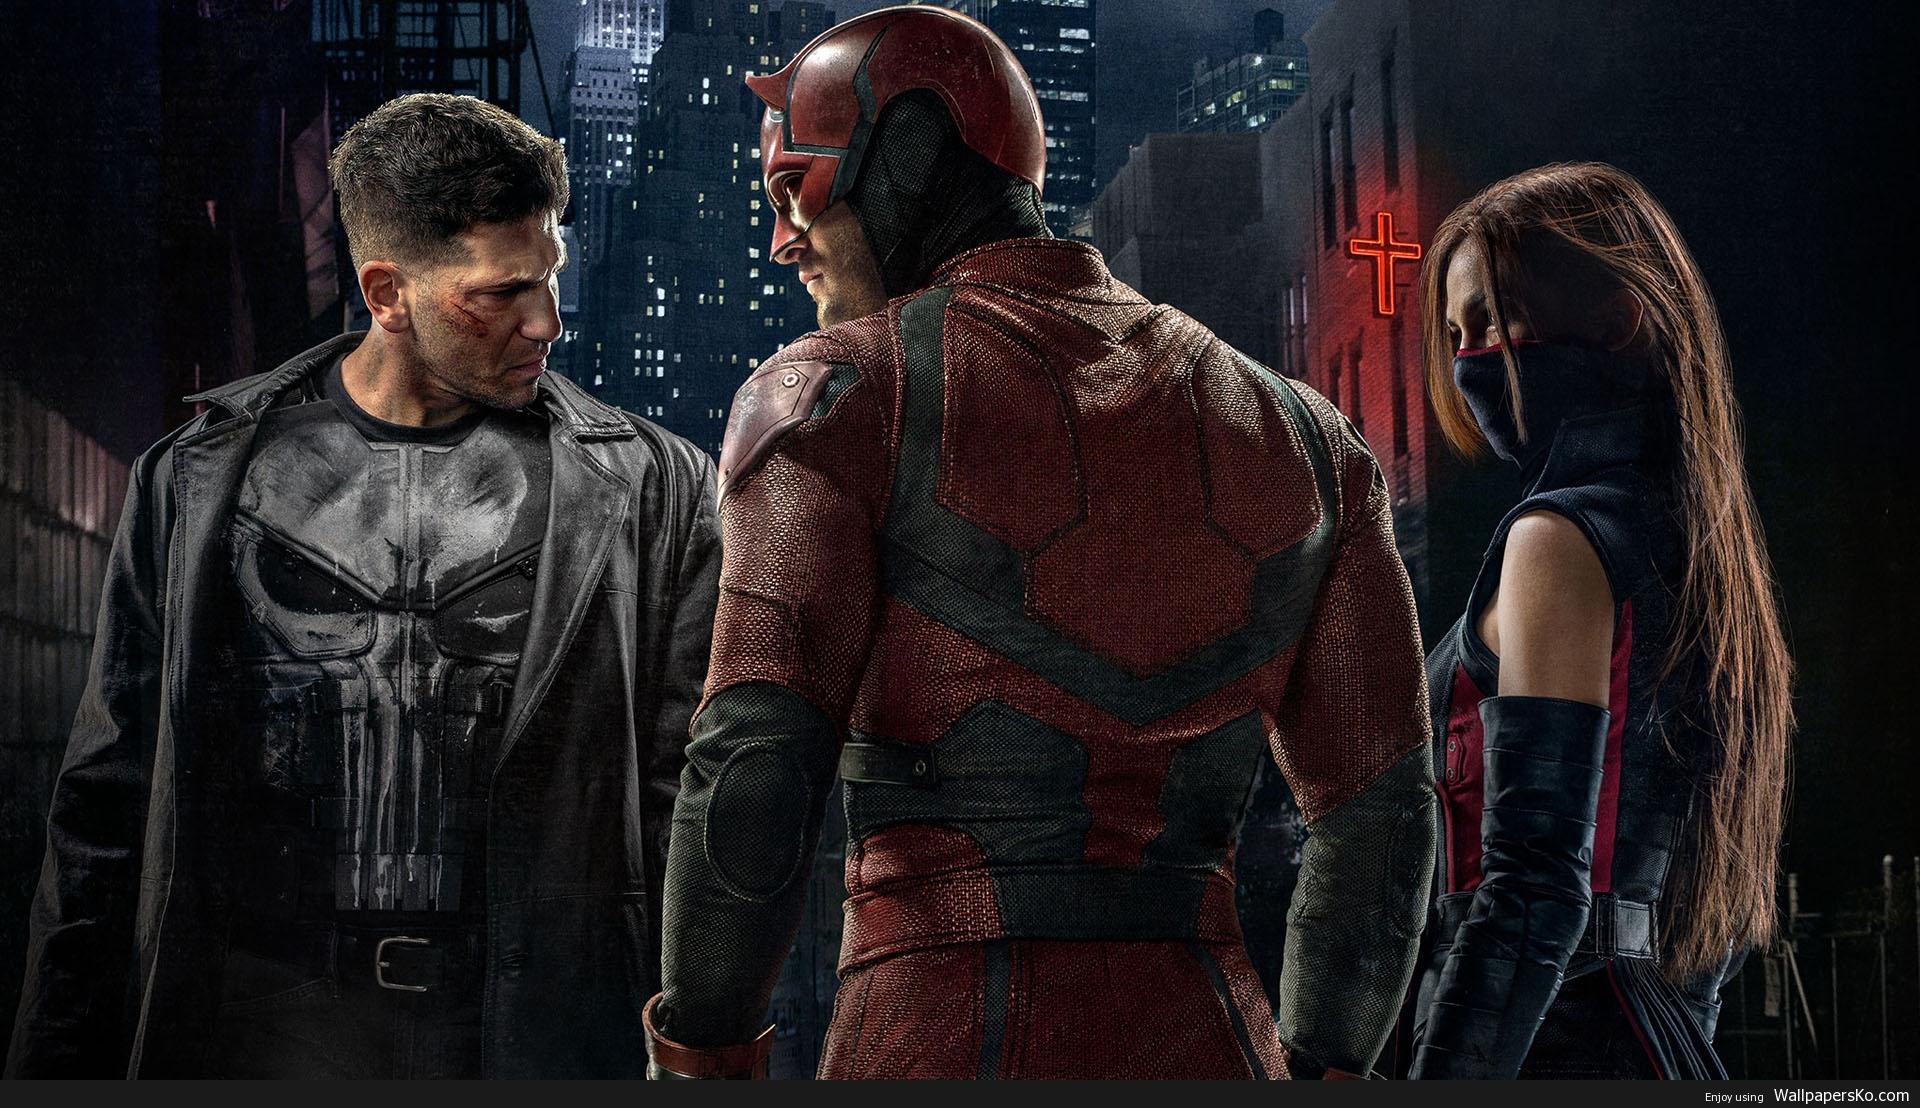 daredevil season 2 wallpaper